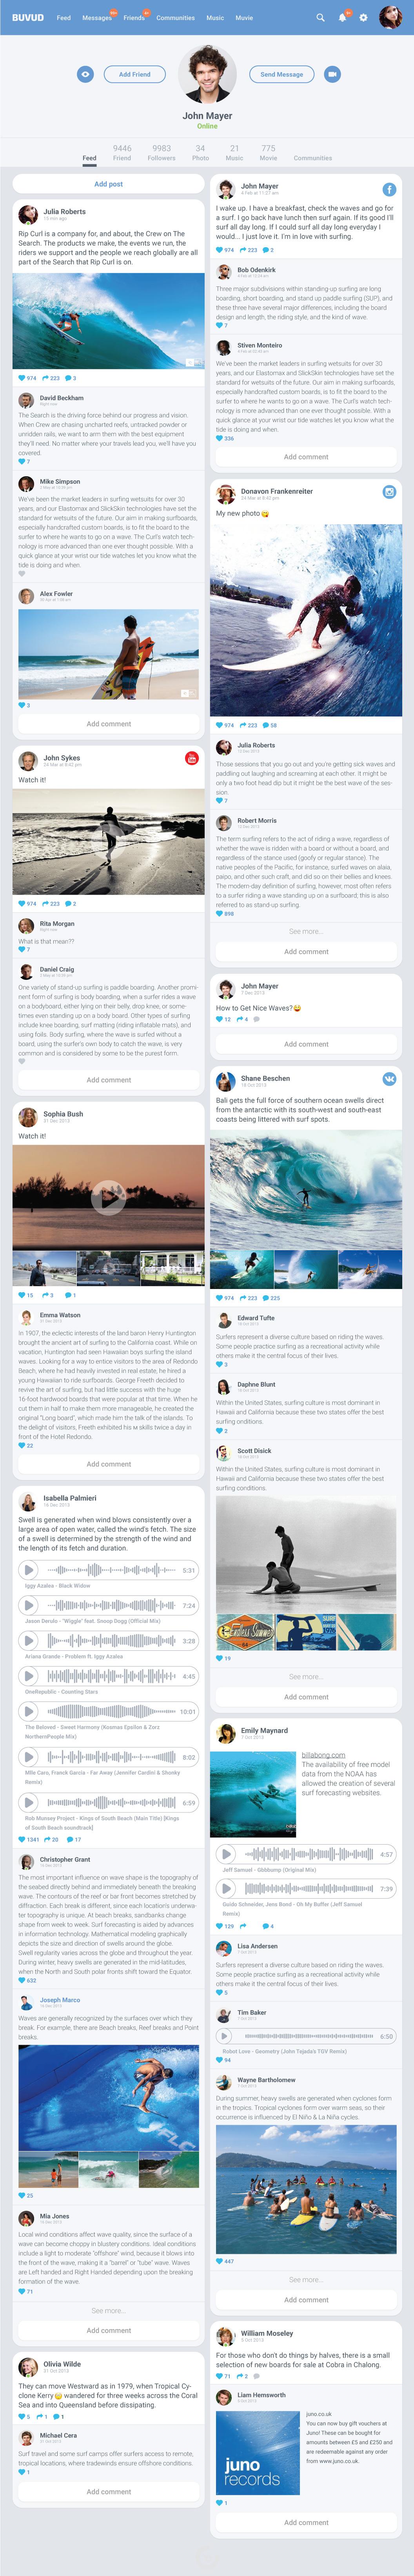 Social Net socialnet UI ux Web account